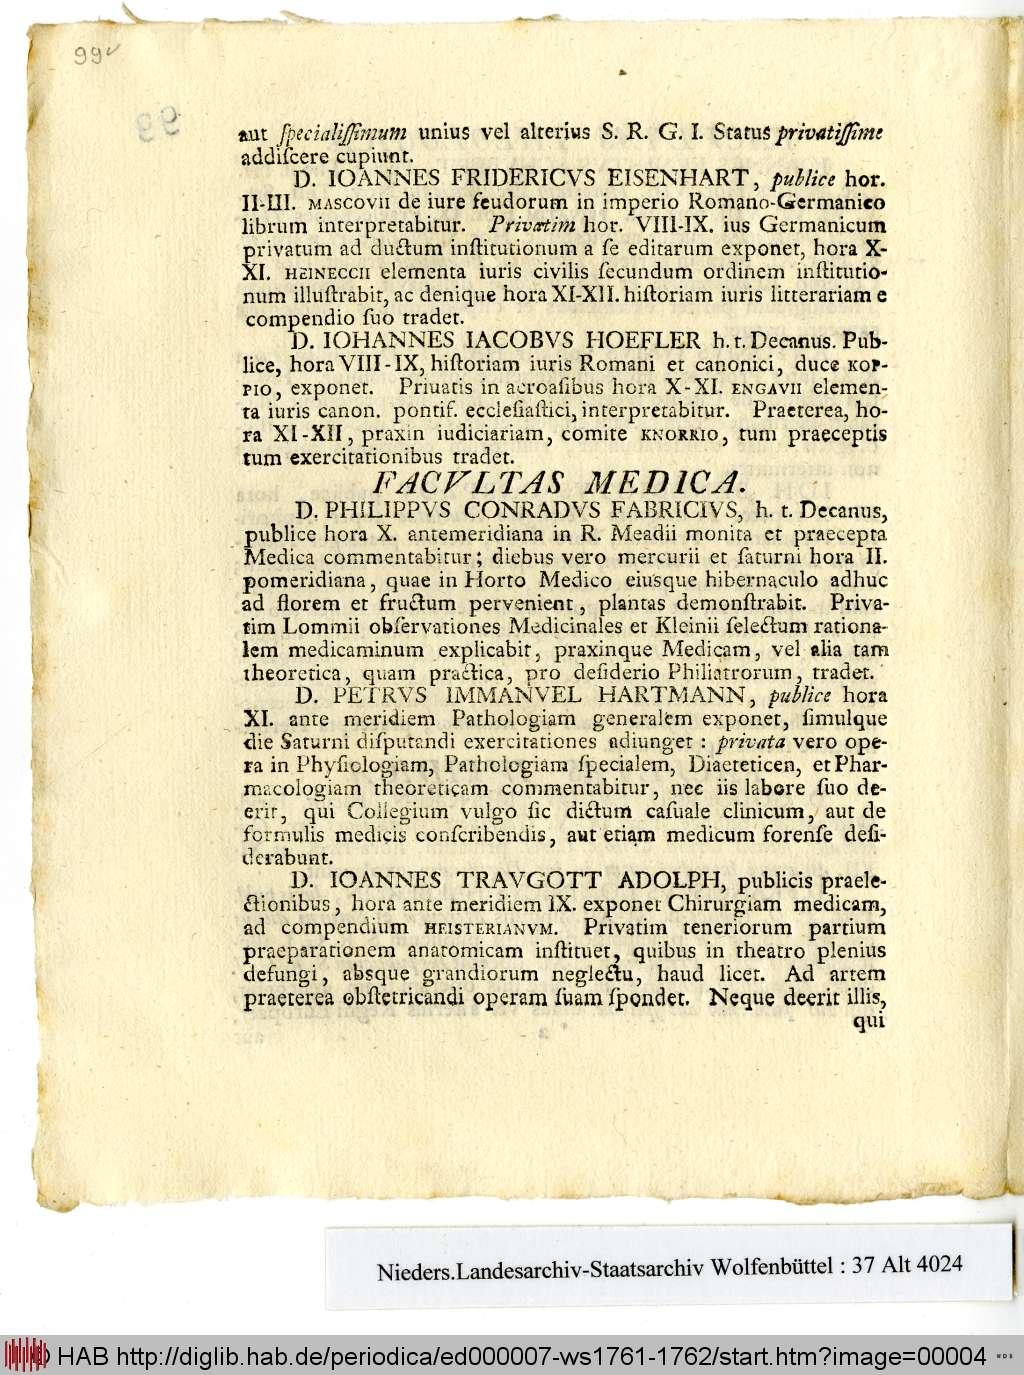 https://diglib.hab.de/periodica/ed000007-ws1761-1762/00004.jpg